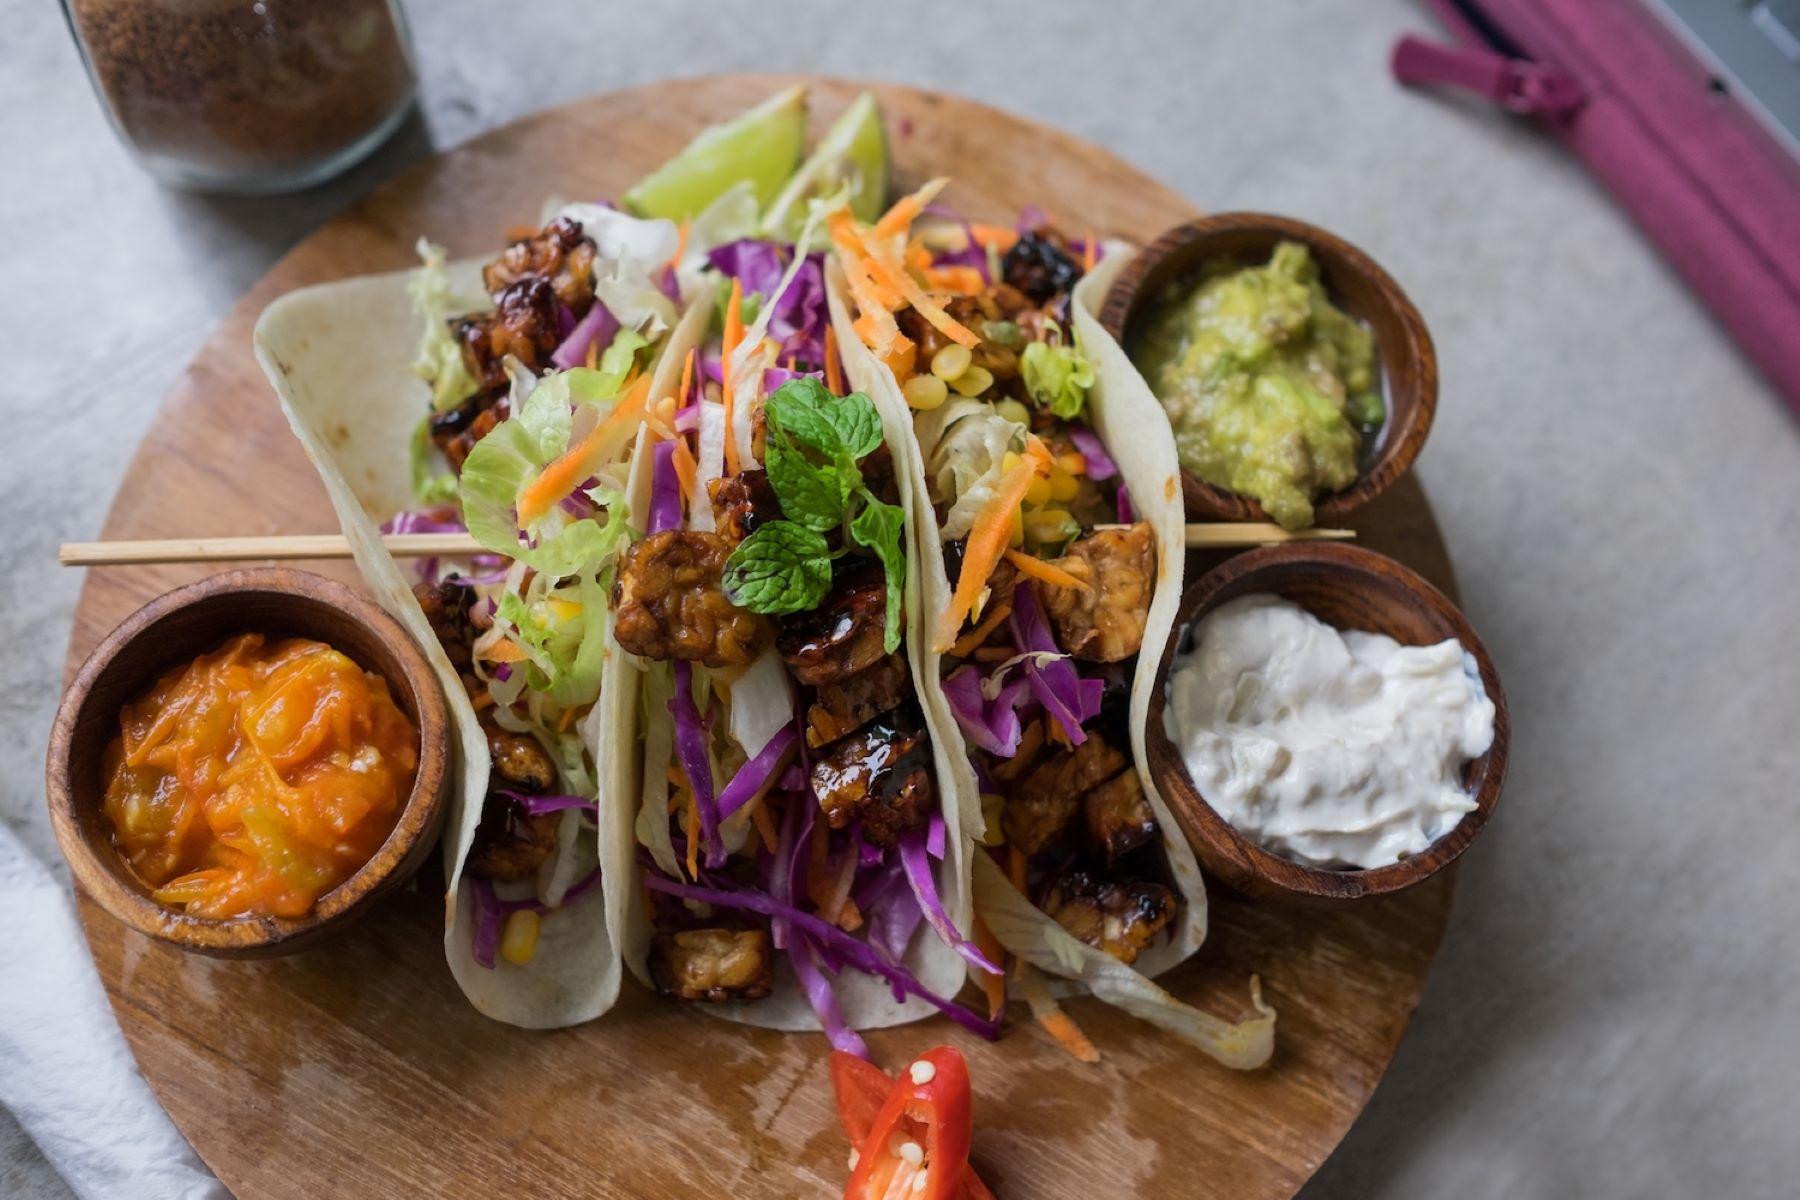 vegan tacos at restaurants